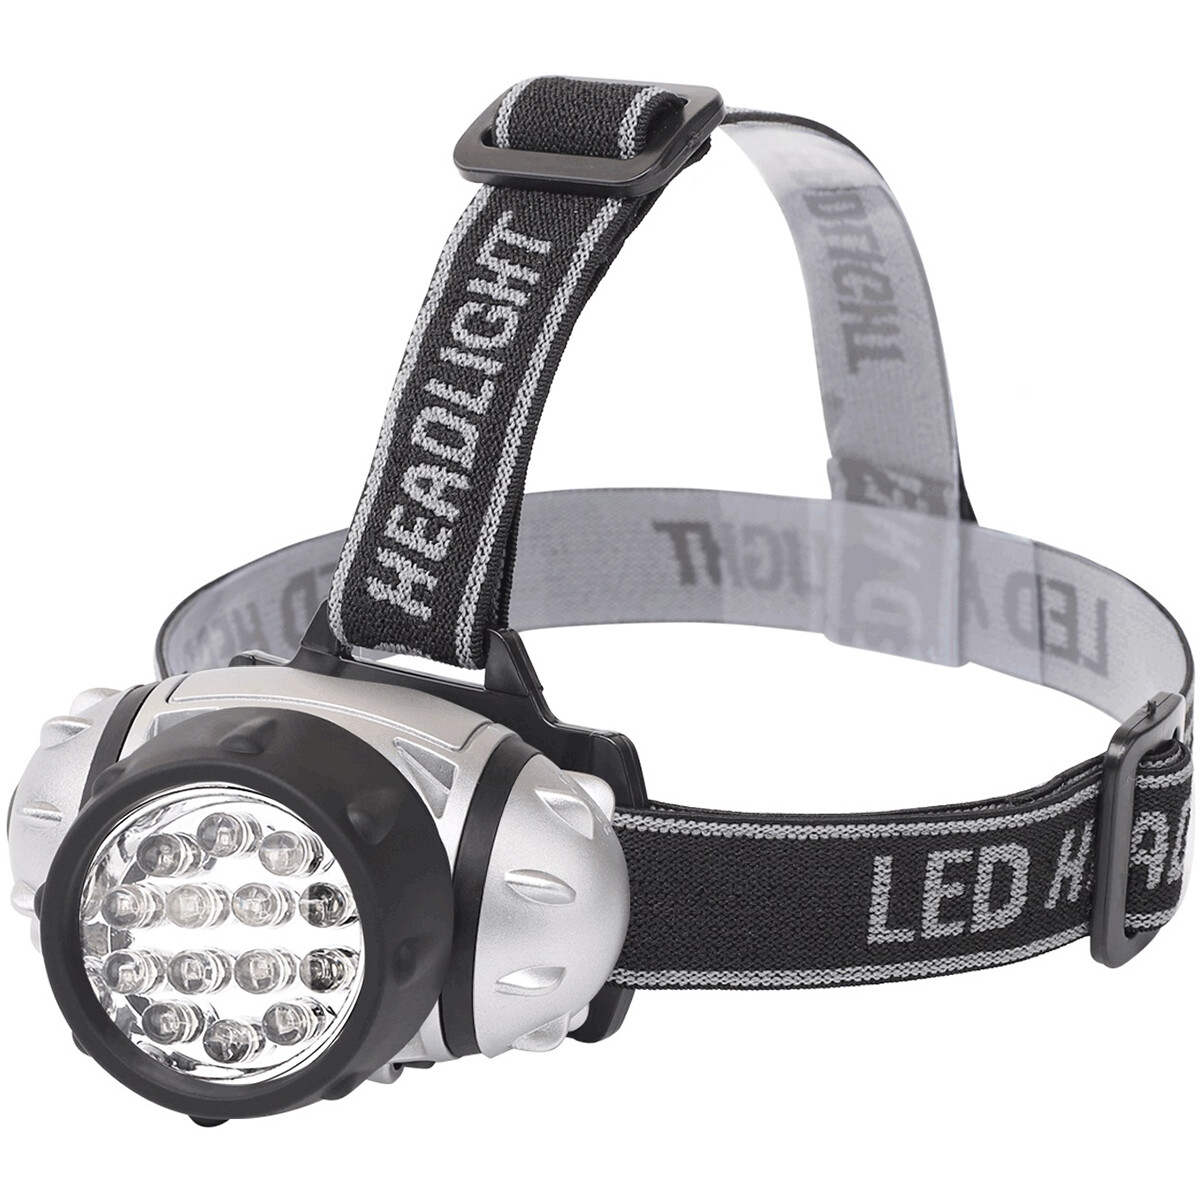 LED Hoofdlamp - Aigi Heady - Waterdicht - 35 Meter - Kantelbaar - 14 LED's - 1W - Zilver | Vervangt